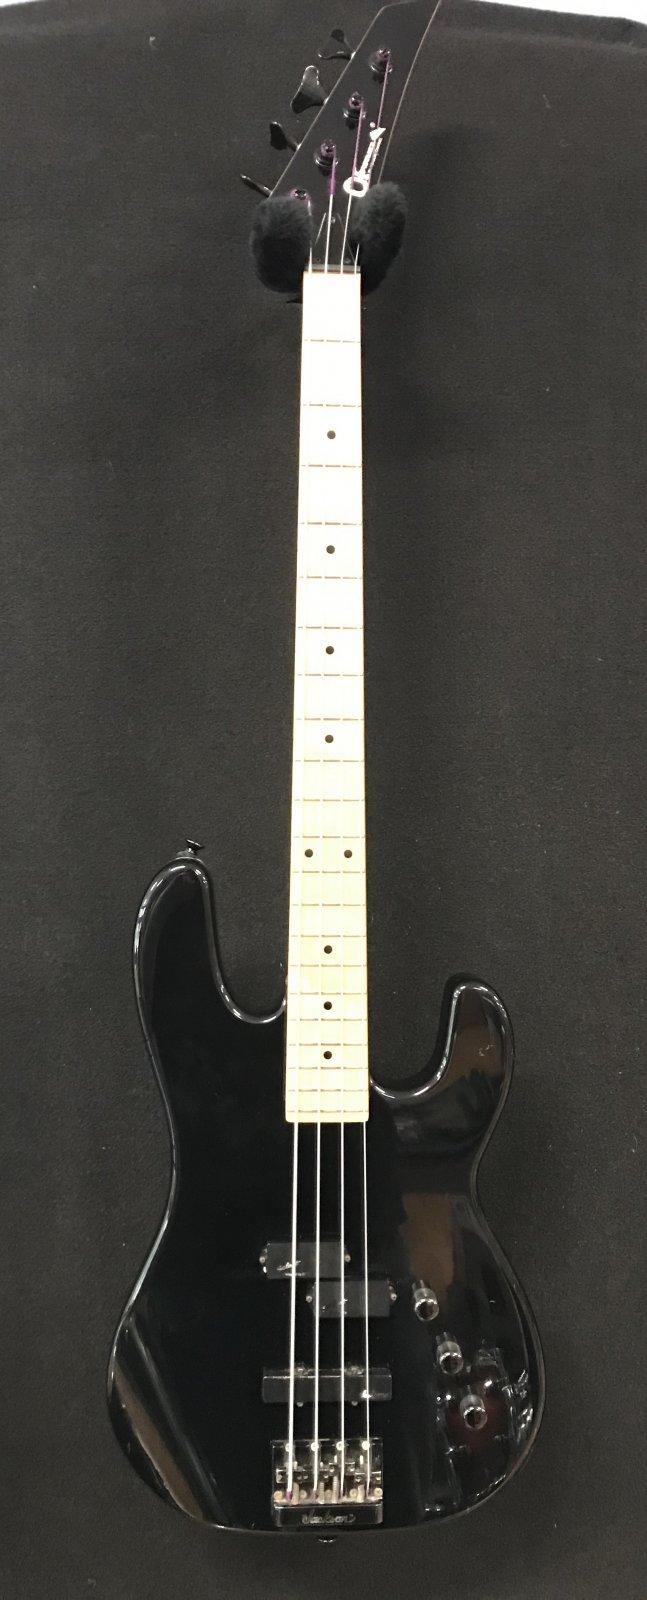 Used Charvel bass black